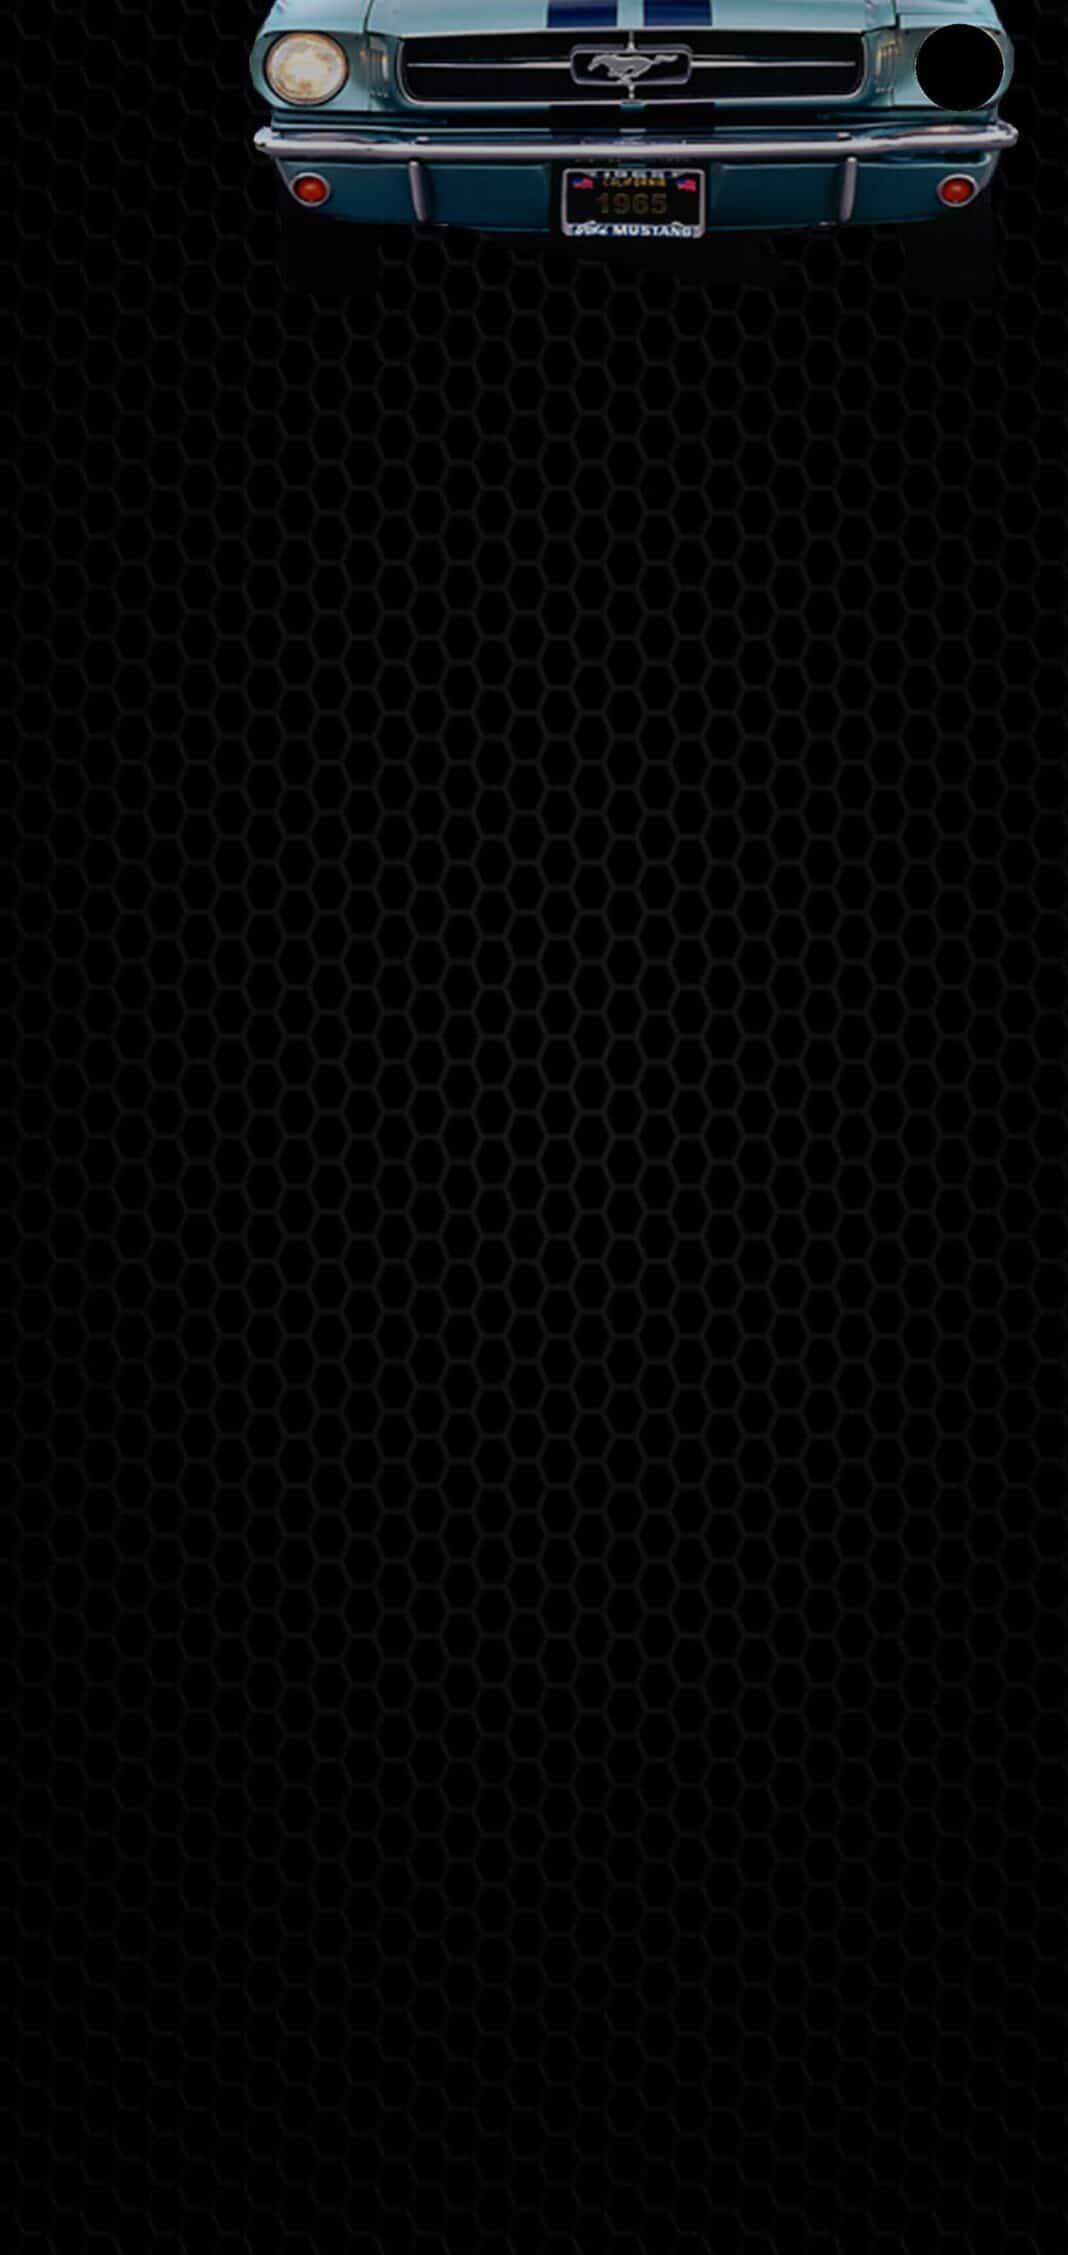 Samsung Galaxy S10 wallpaper foto 2